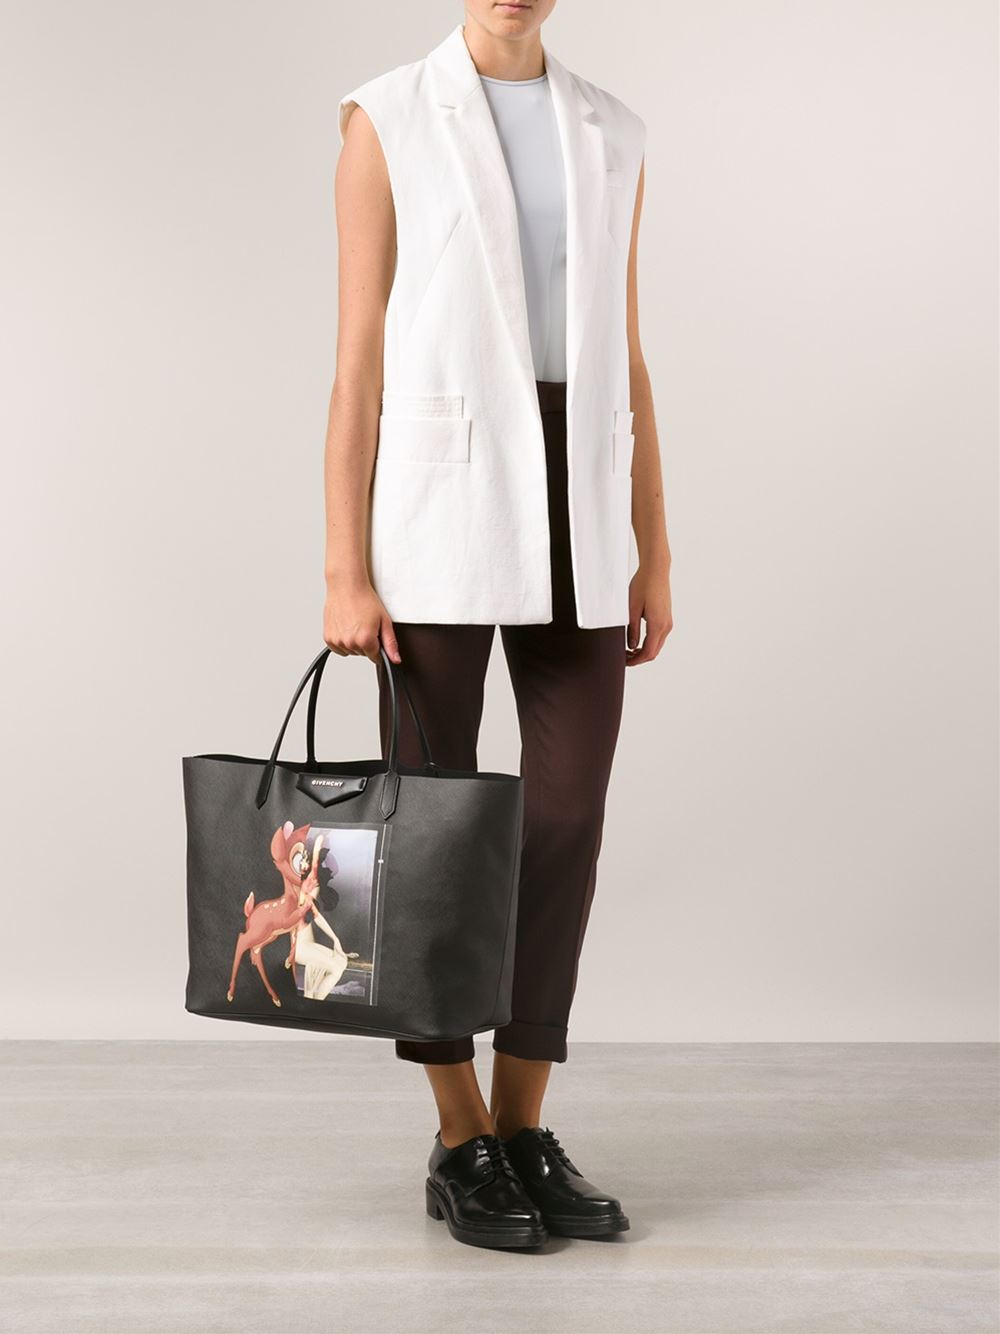 ... new arrival 715c8 ae2cc Givenchy Antigona Shopper Tote in Black - Lyst  ... f6a2d2926e